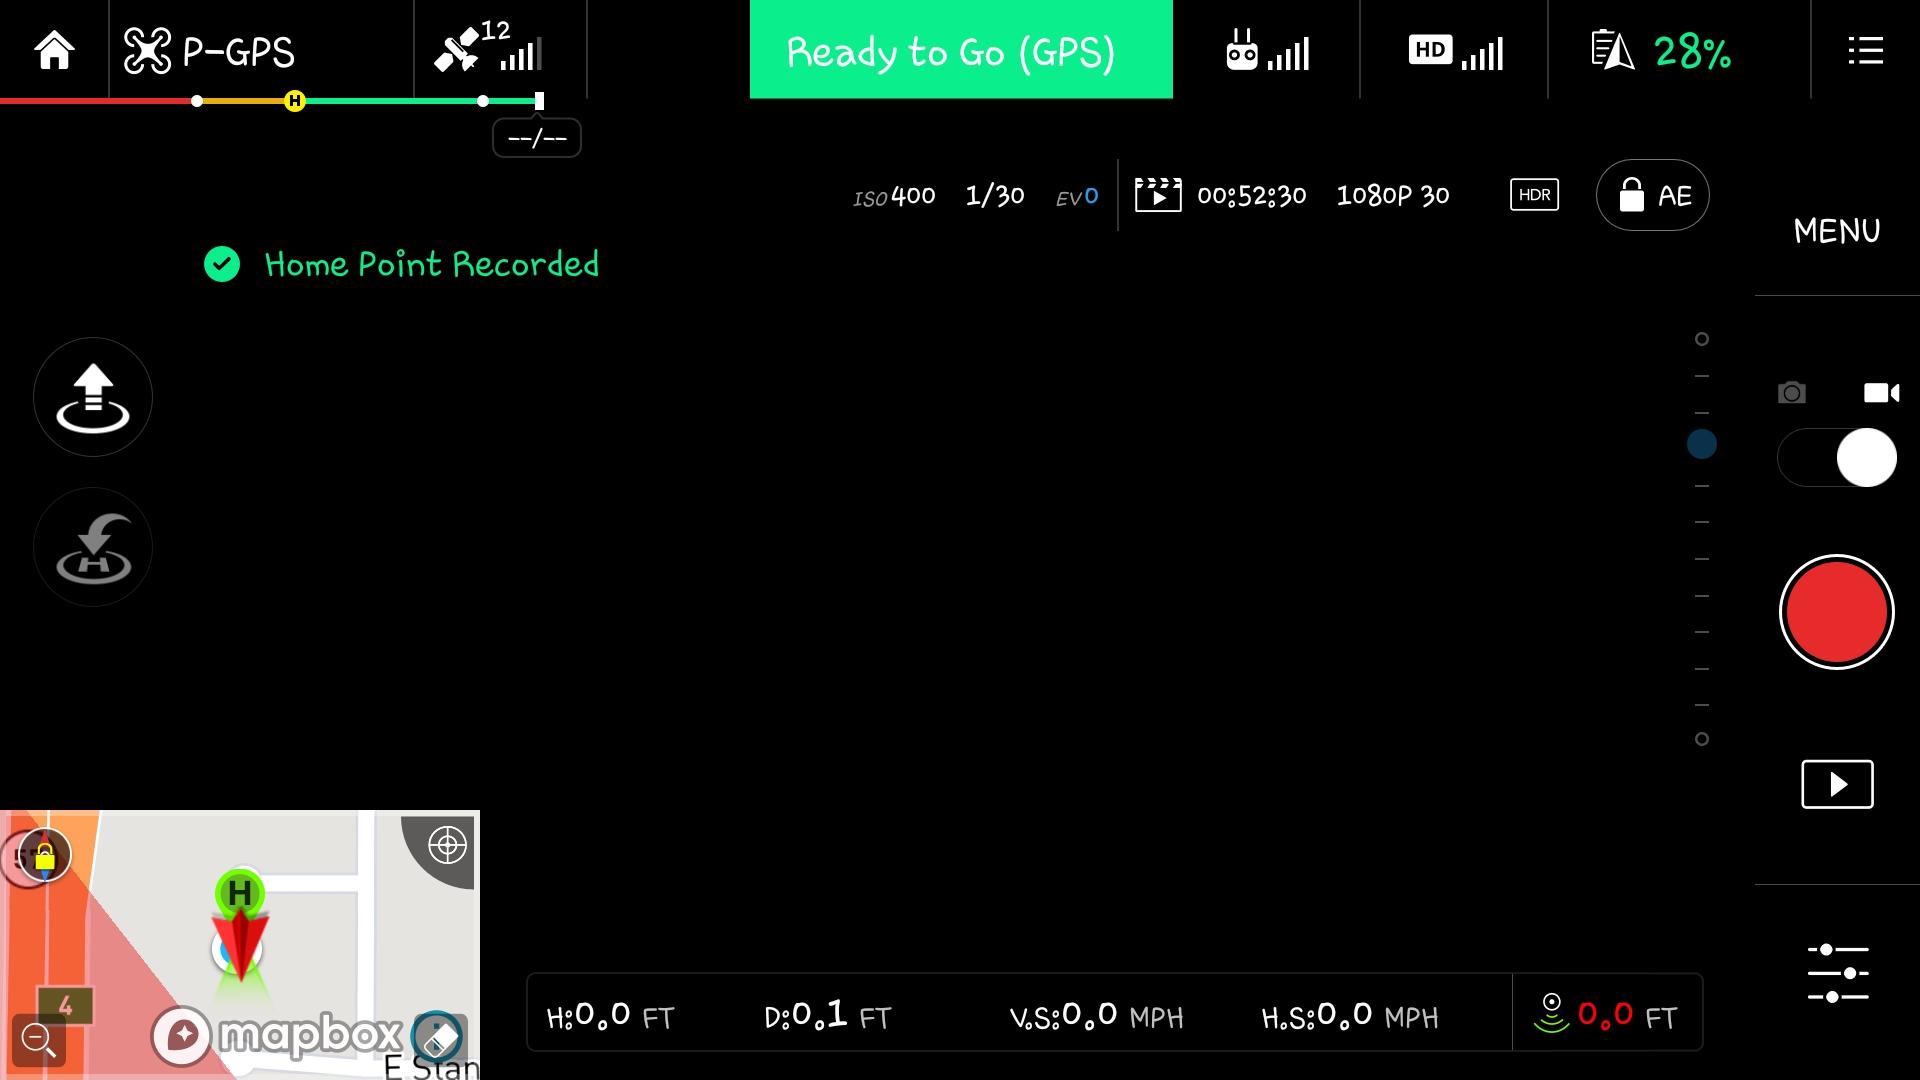 DJI GO app main view